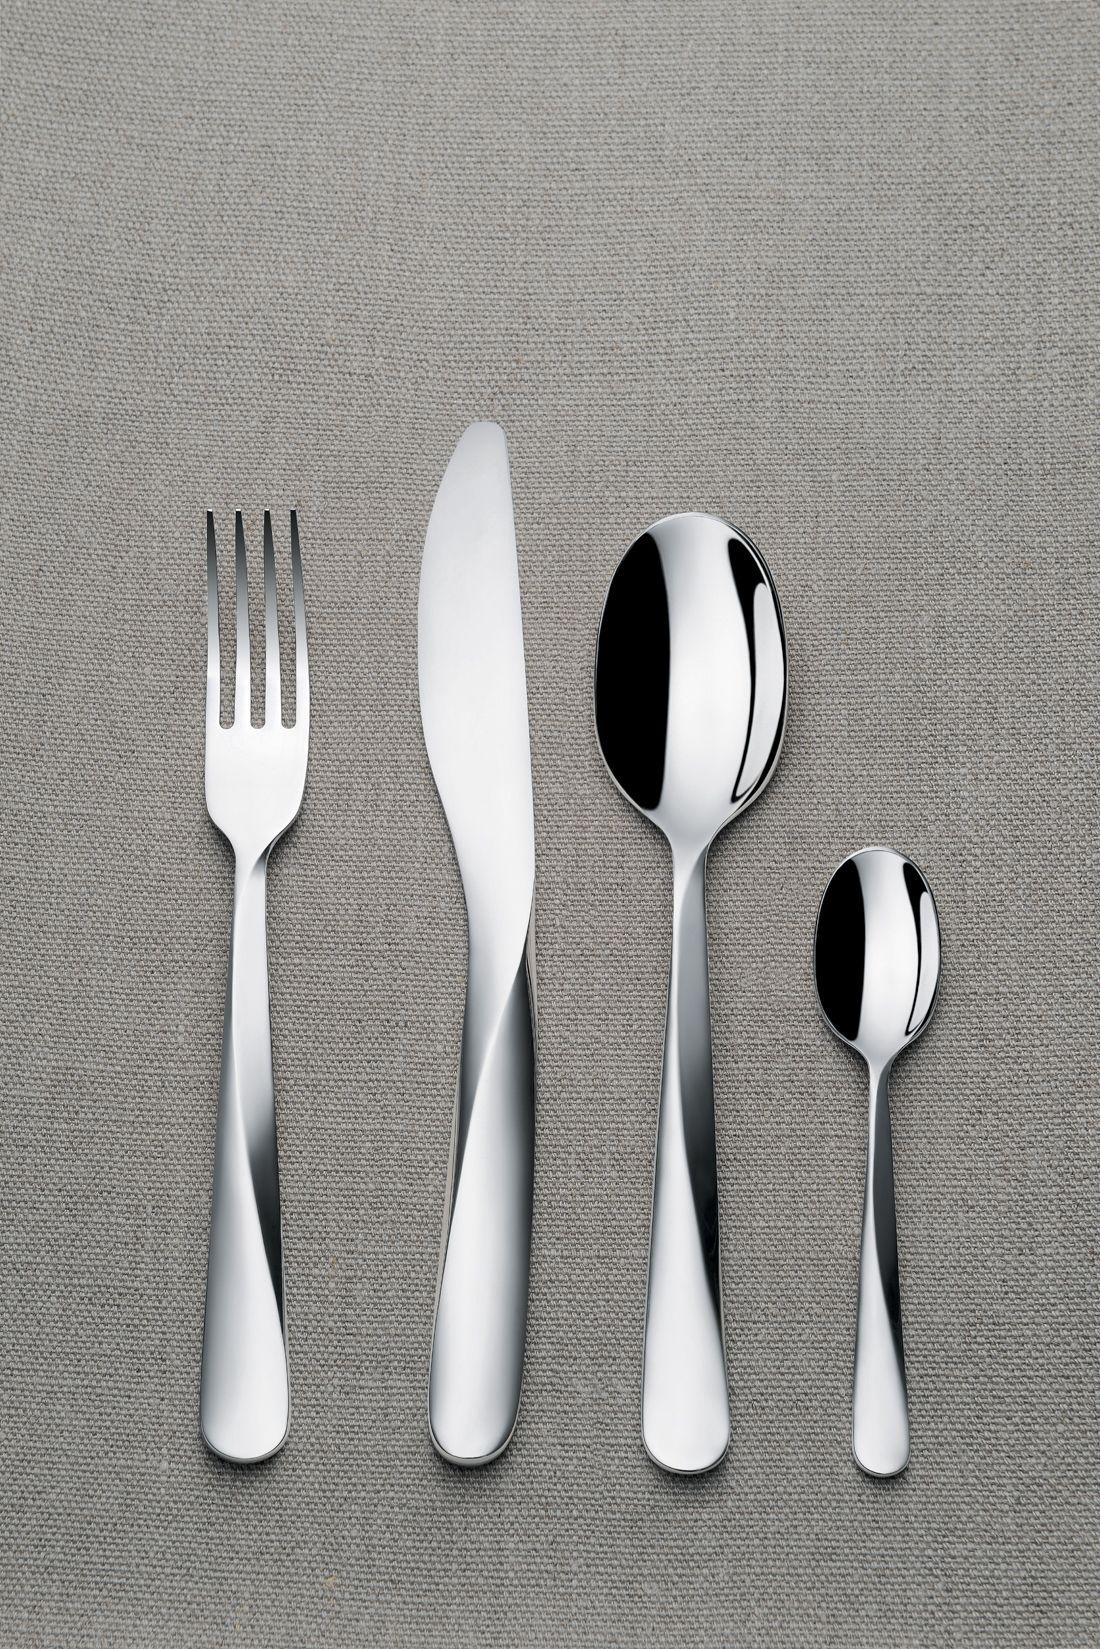 Chic New Cutlery Inspired By Architecture Cutlery Design Tableware Design Design Milk